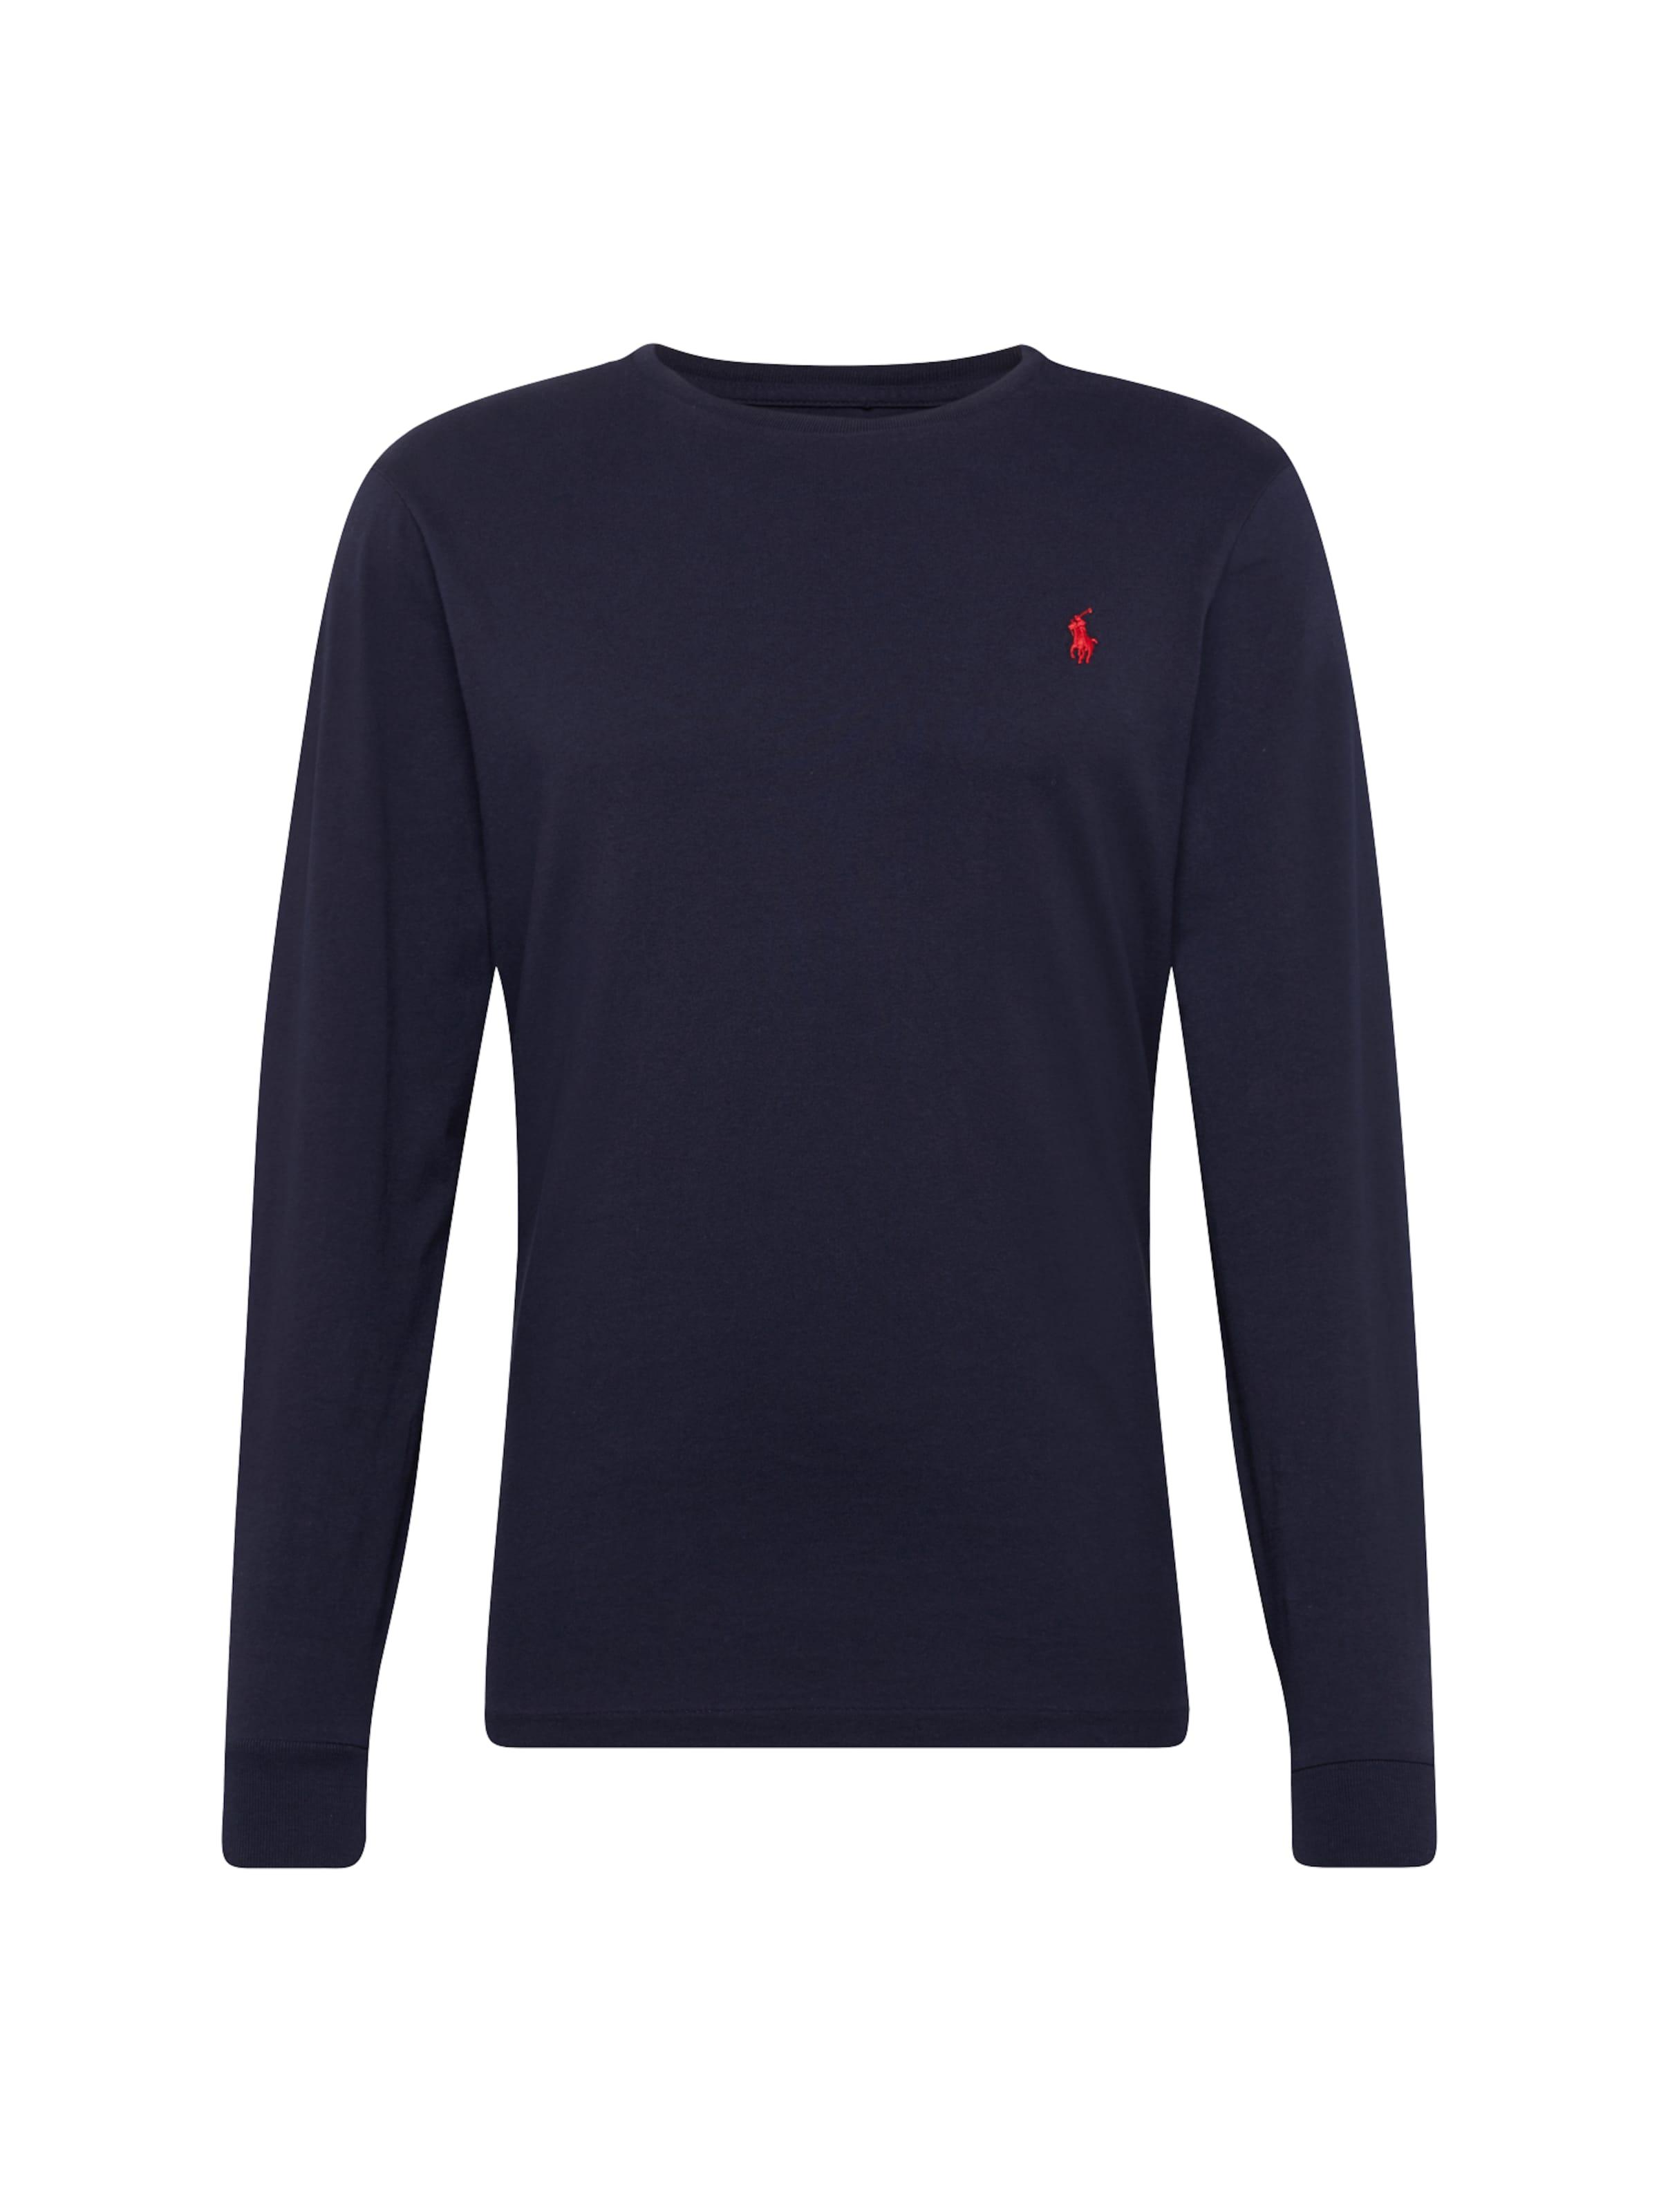 Noir In 1 Jersey lsl Polo shirt LaurenT '26 tsh' Ralph fgIb6yvY7